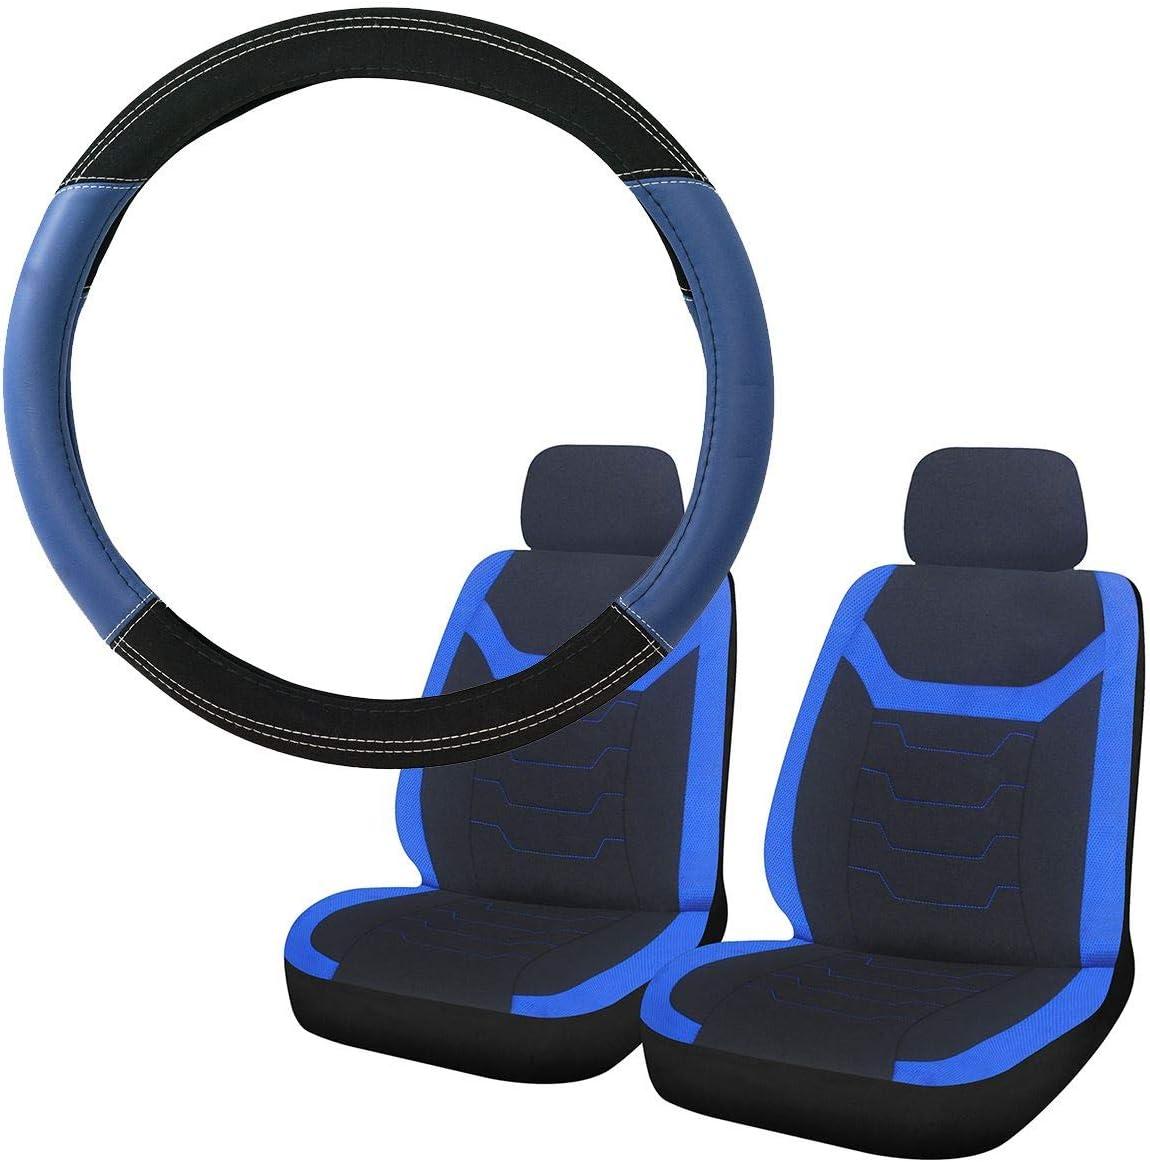 UKB4C Blue /& Black Steering Wheel /& Front Seat Cover set for Renault Wind